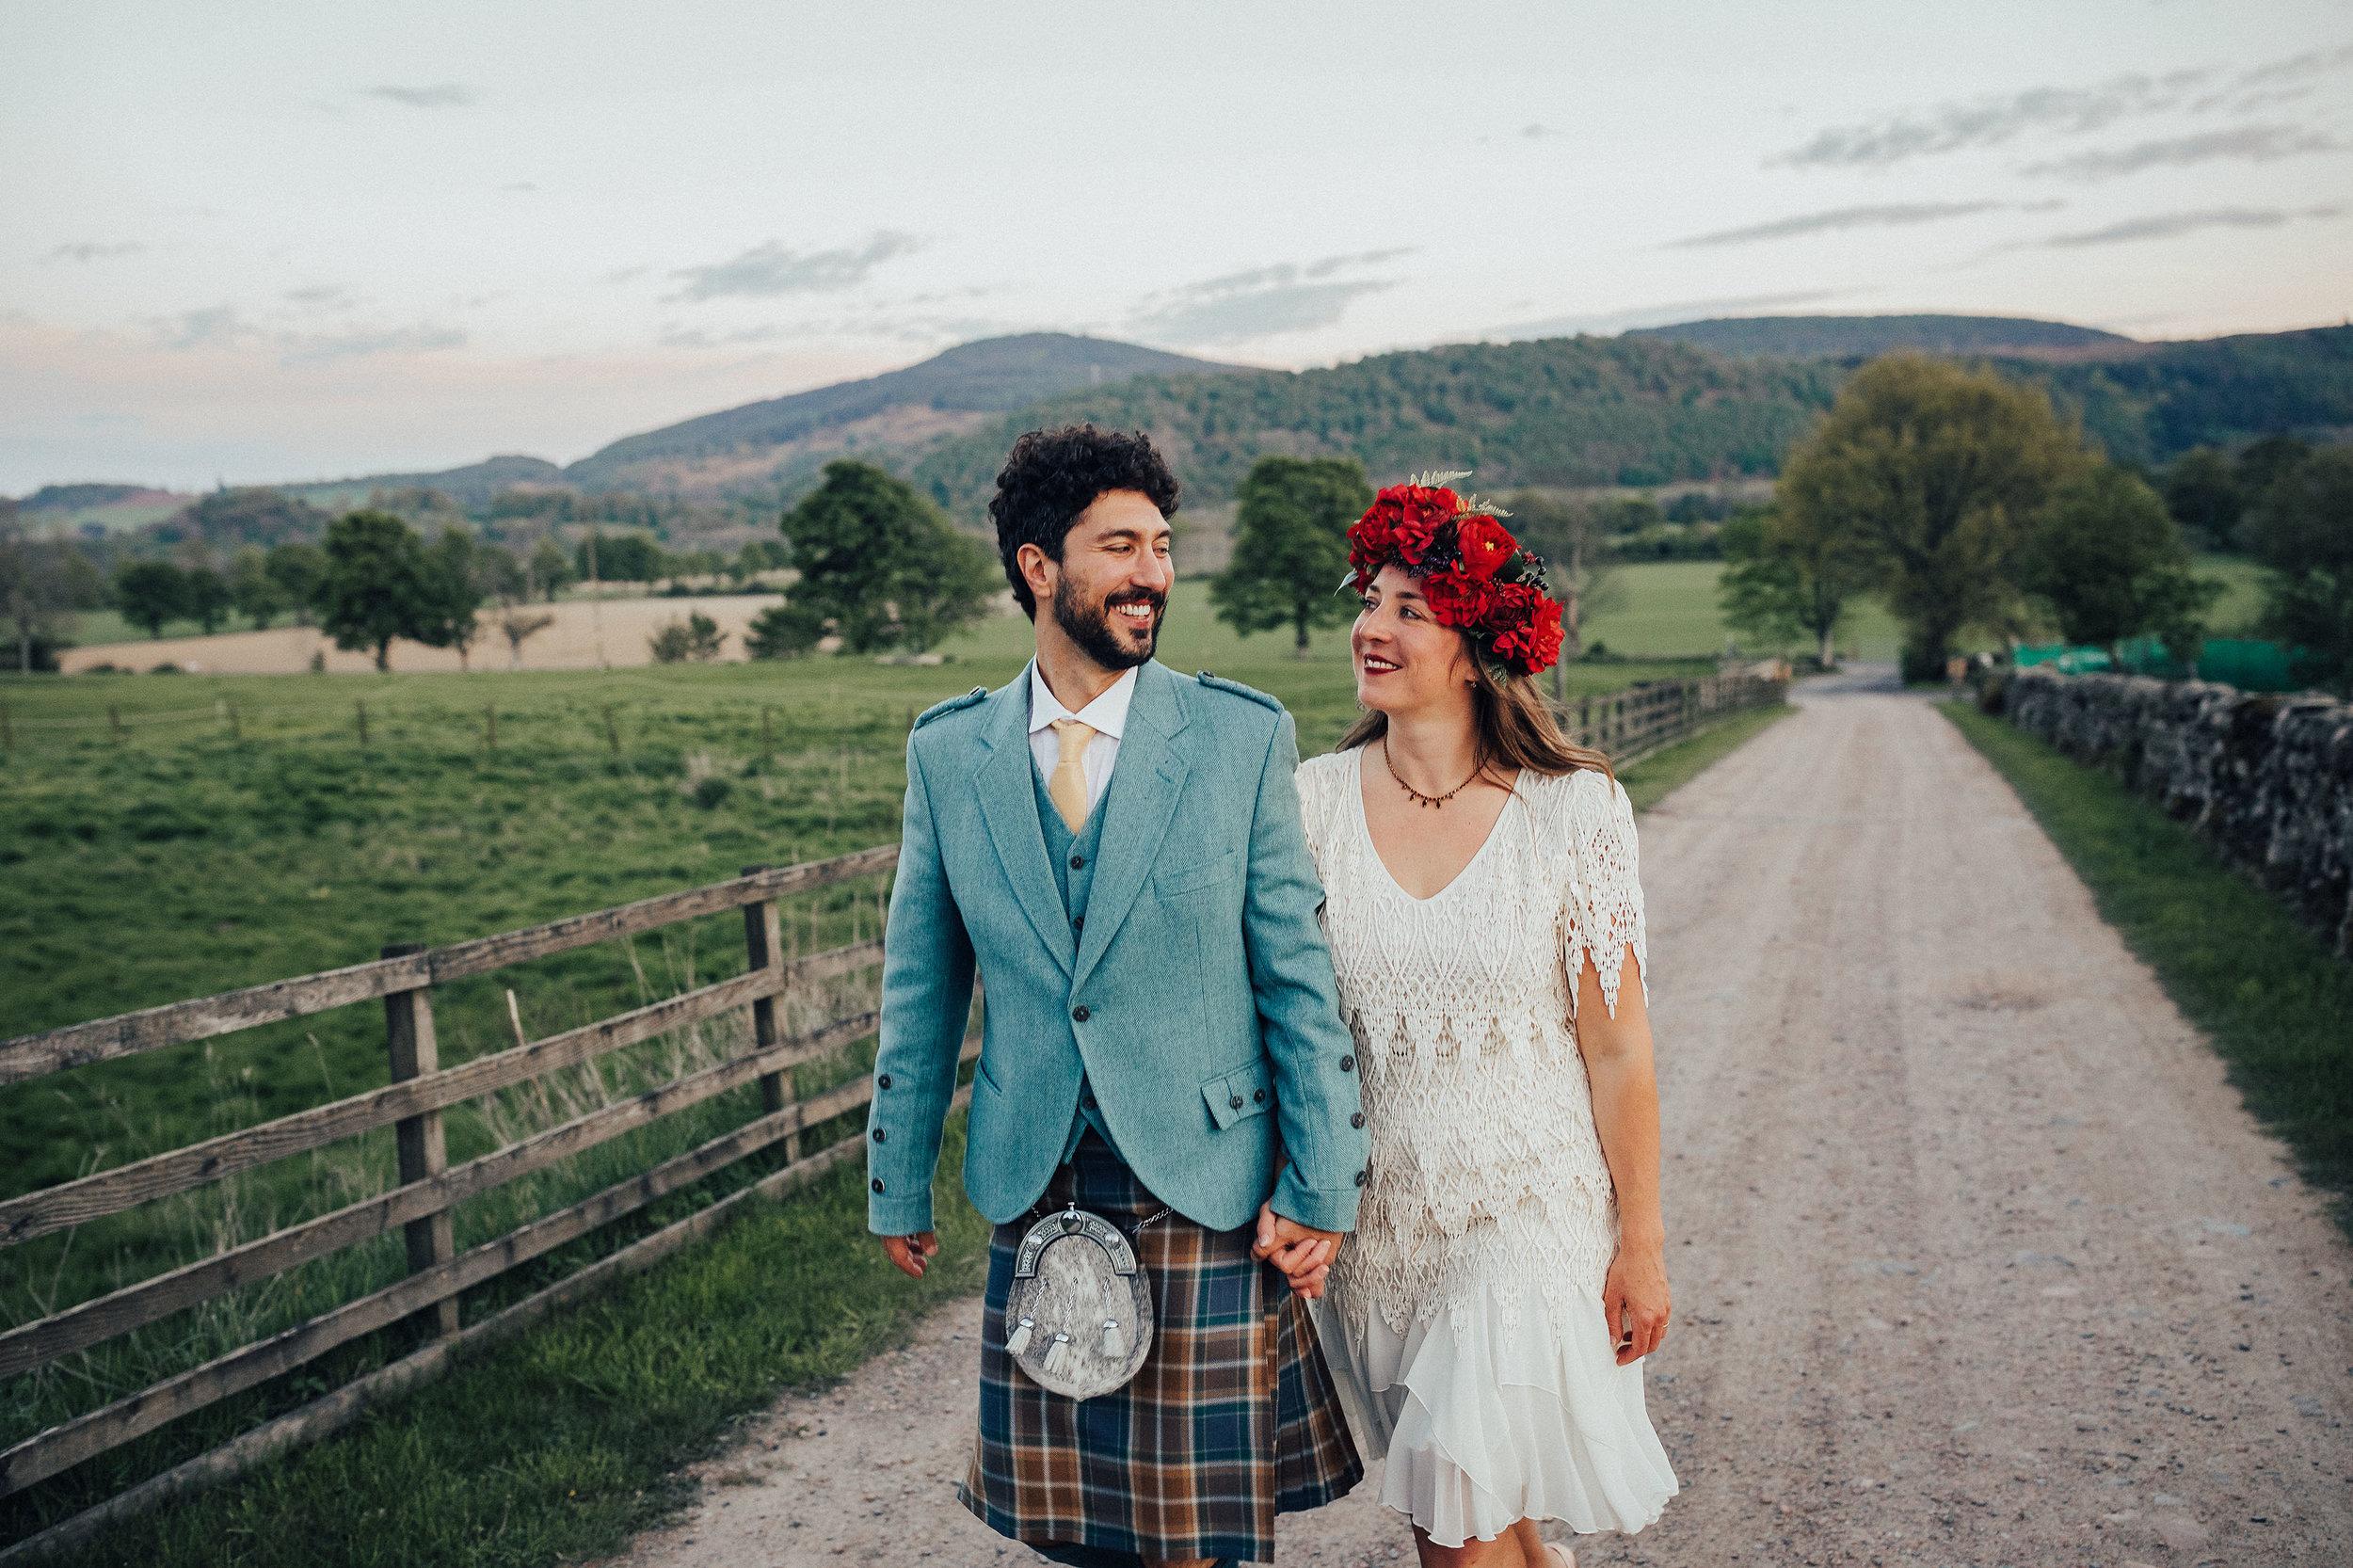 COMRIE_CROFT_WEDDINGS_PJ_PHILLIPS_PHOTOGRAPHY_194.jpg